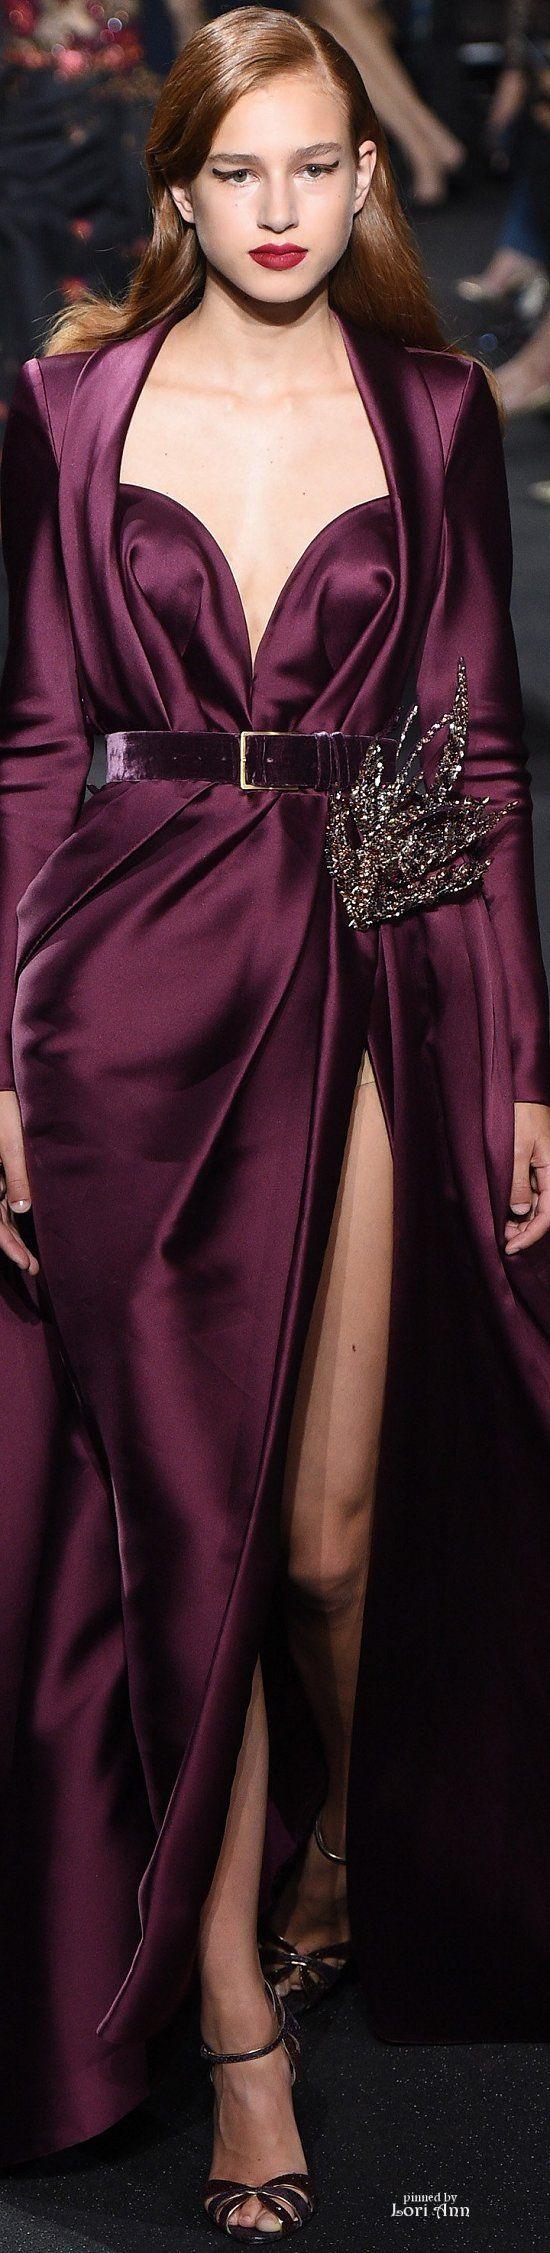 Elie Saab Couture Fall 2016 beautiful colour for an Autumn wedding. #weddinggown #weddinginspo #bride #bridetobe #weddings #weddingideas #bespokeweddingdress #dressmaker #dressmakers #miltonkeynes #buckinghamshire #bedfordshire #oxfordshire #northants #uk #lesleycutler #lesleycutlerbridal #MyBestMe  #weddingdress #UK